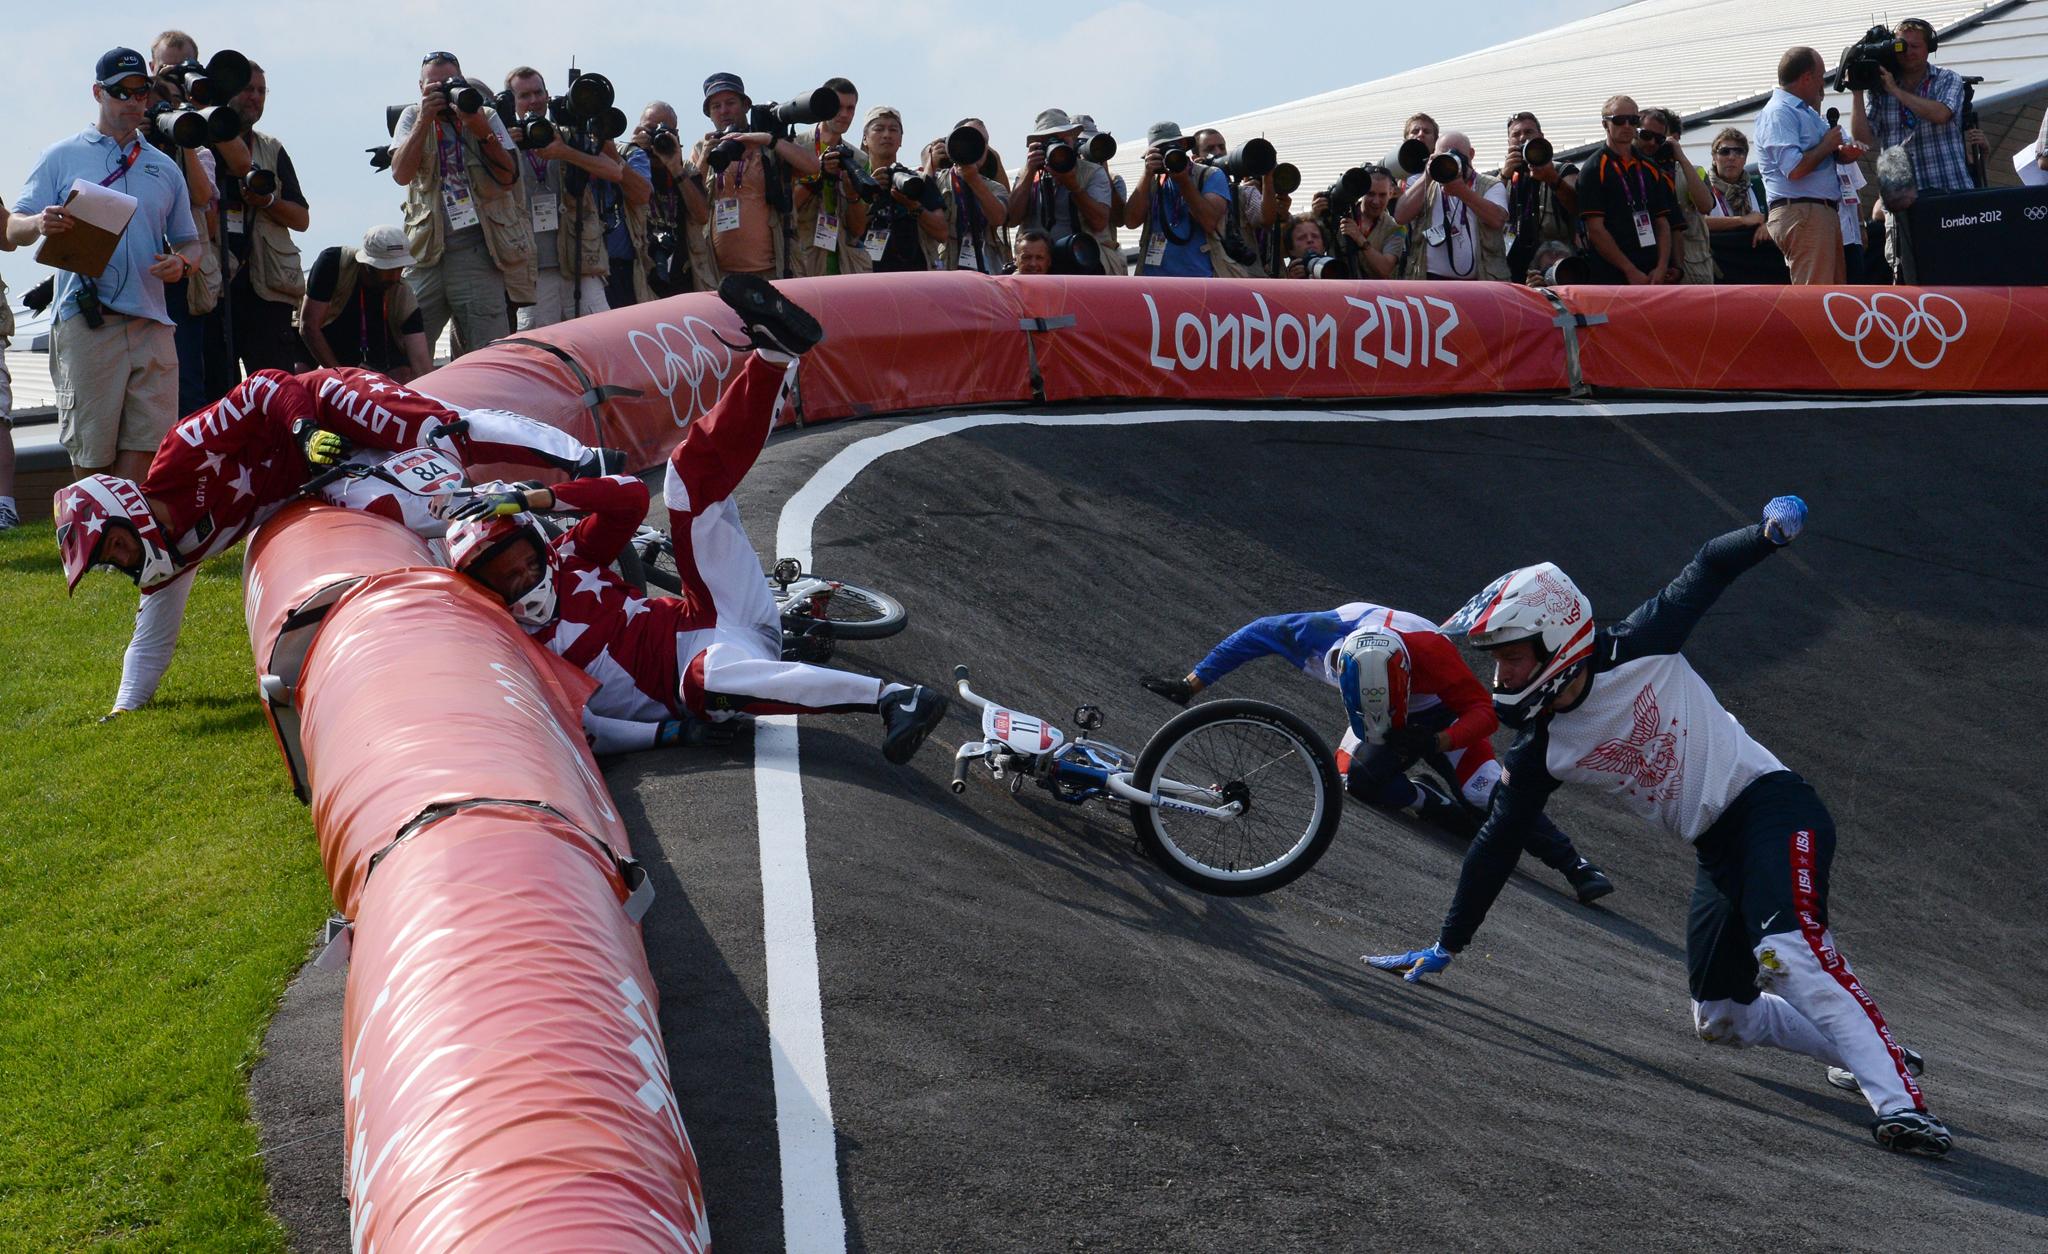 /photo/2012/0810/as_bmx_olympic5_2048.jpg